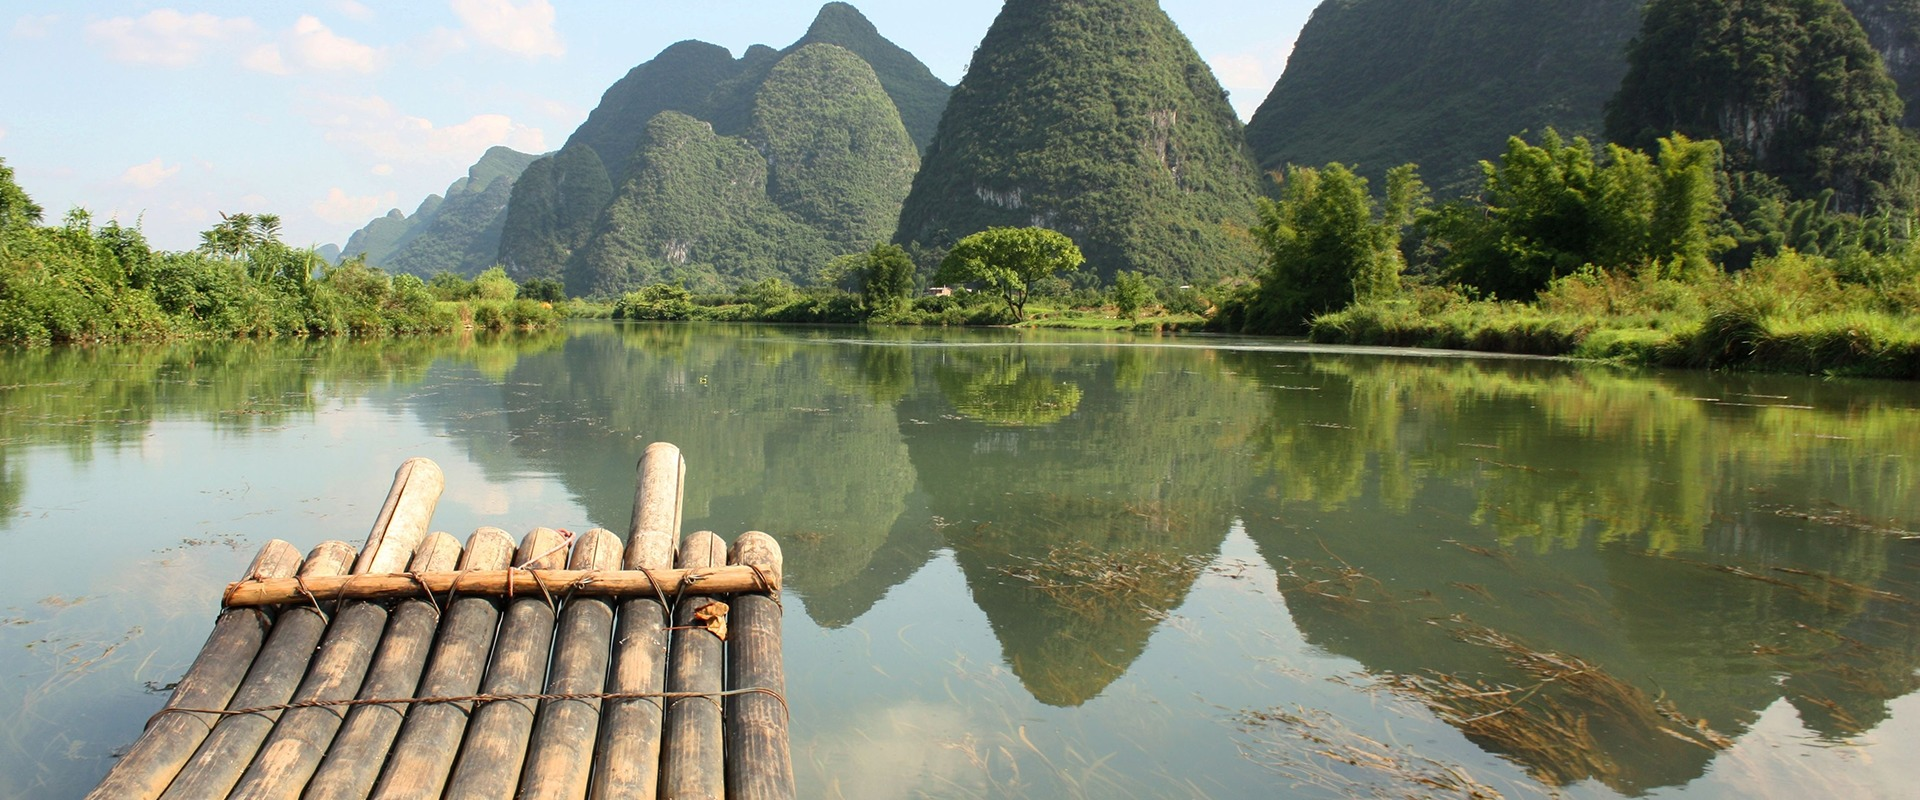 Geography School Trip to China Guilin Yangshuo